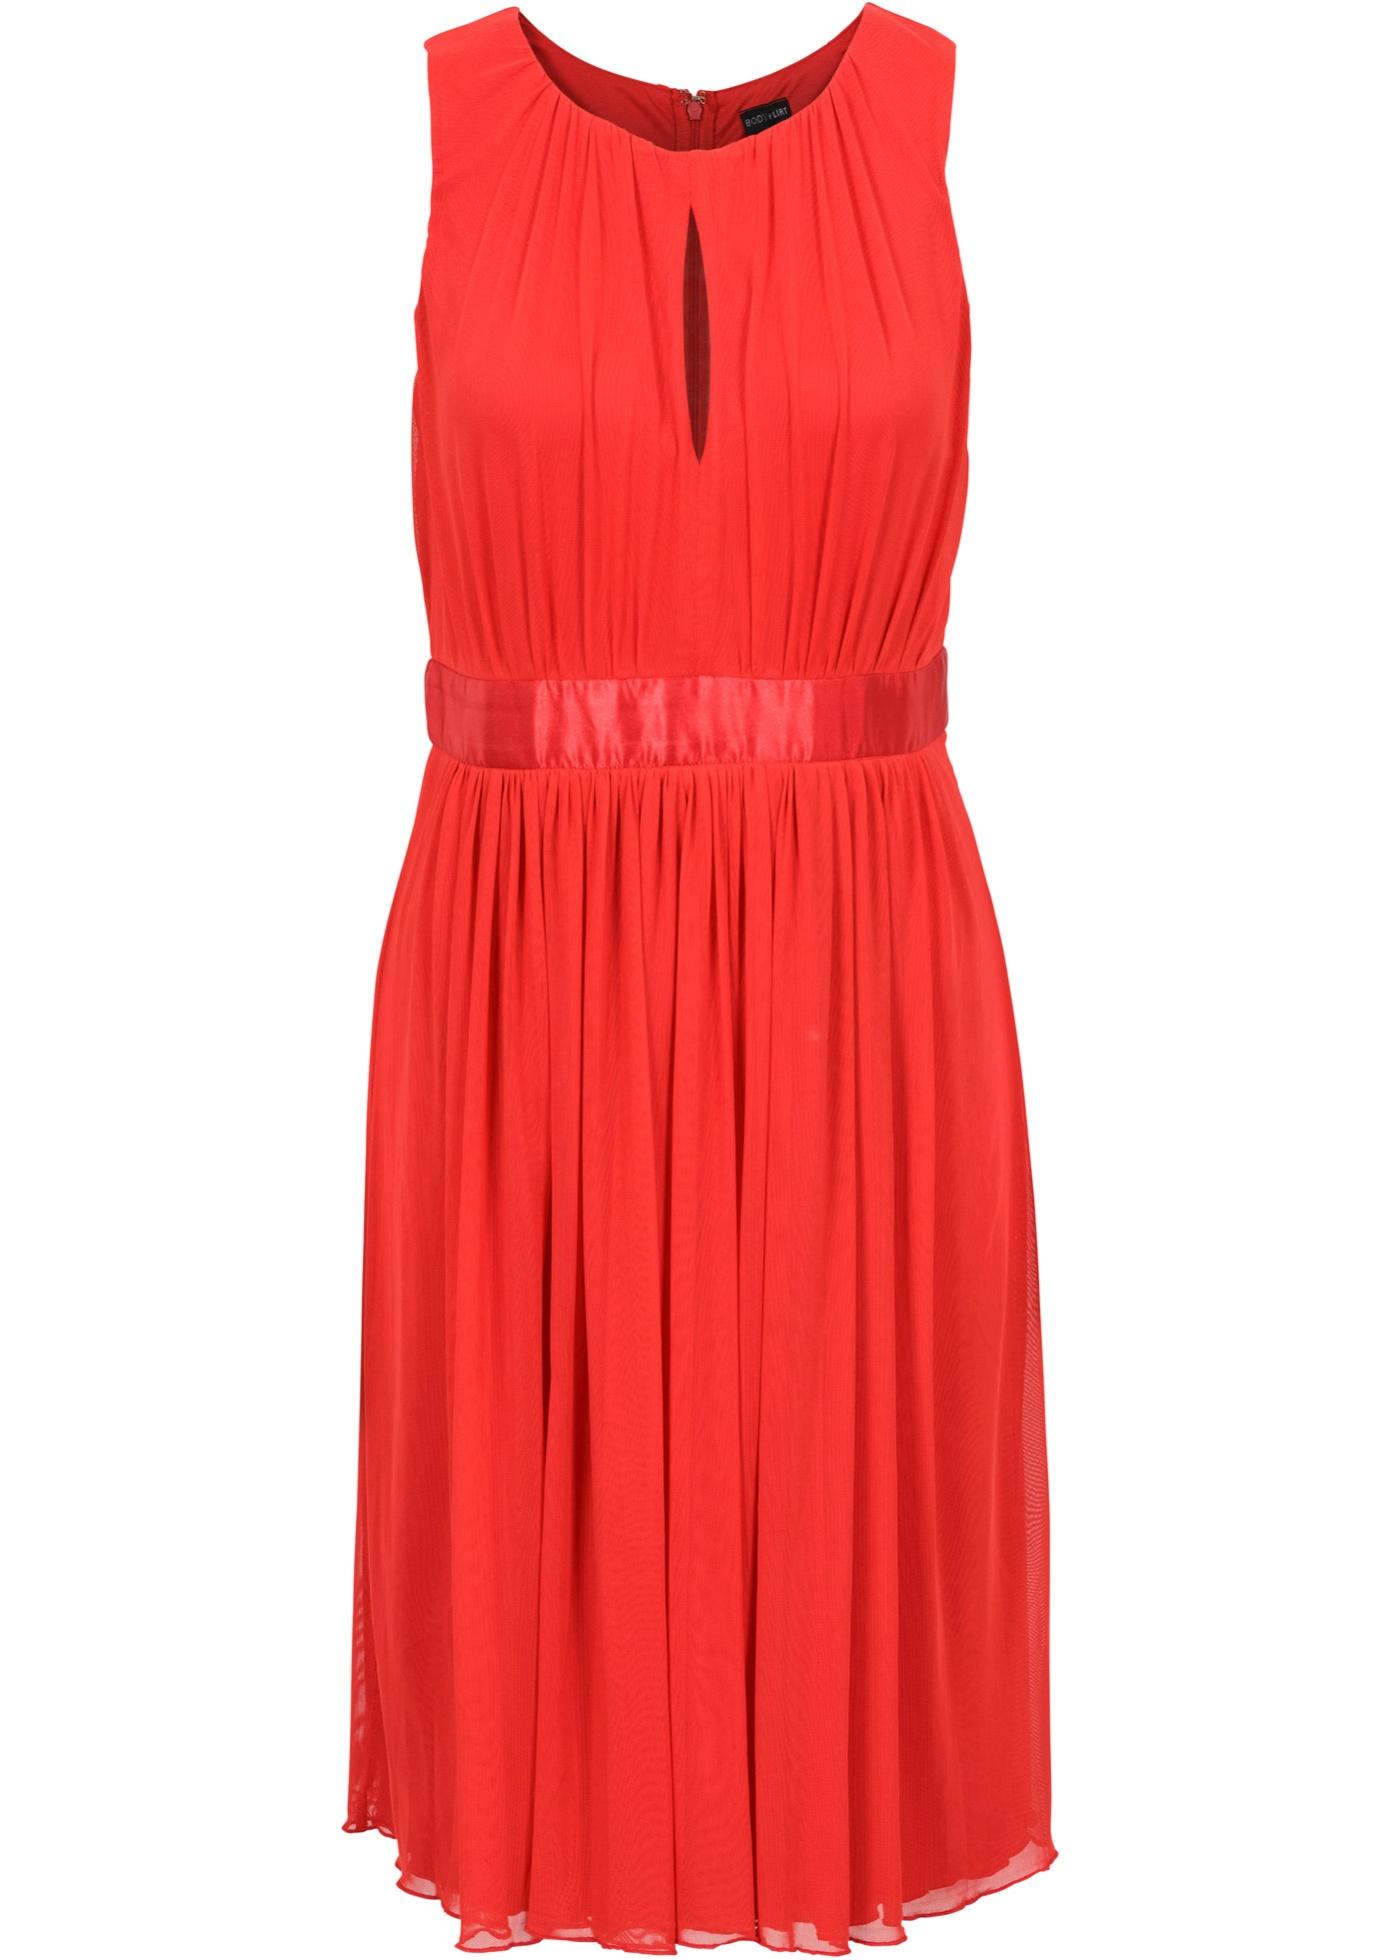 Festtagsmode - Kleid › bonprix › rot  - Onlineshop Bonprix